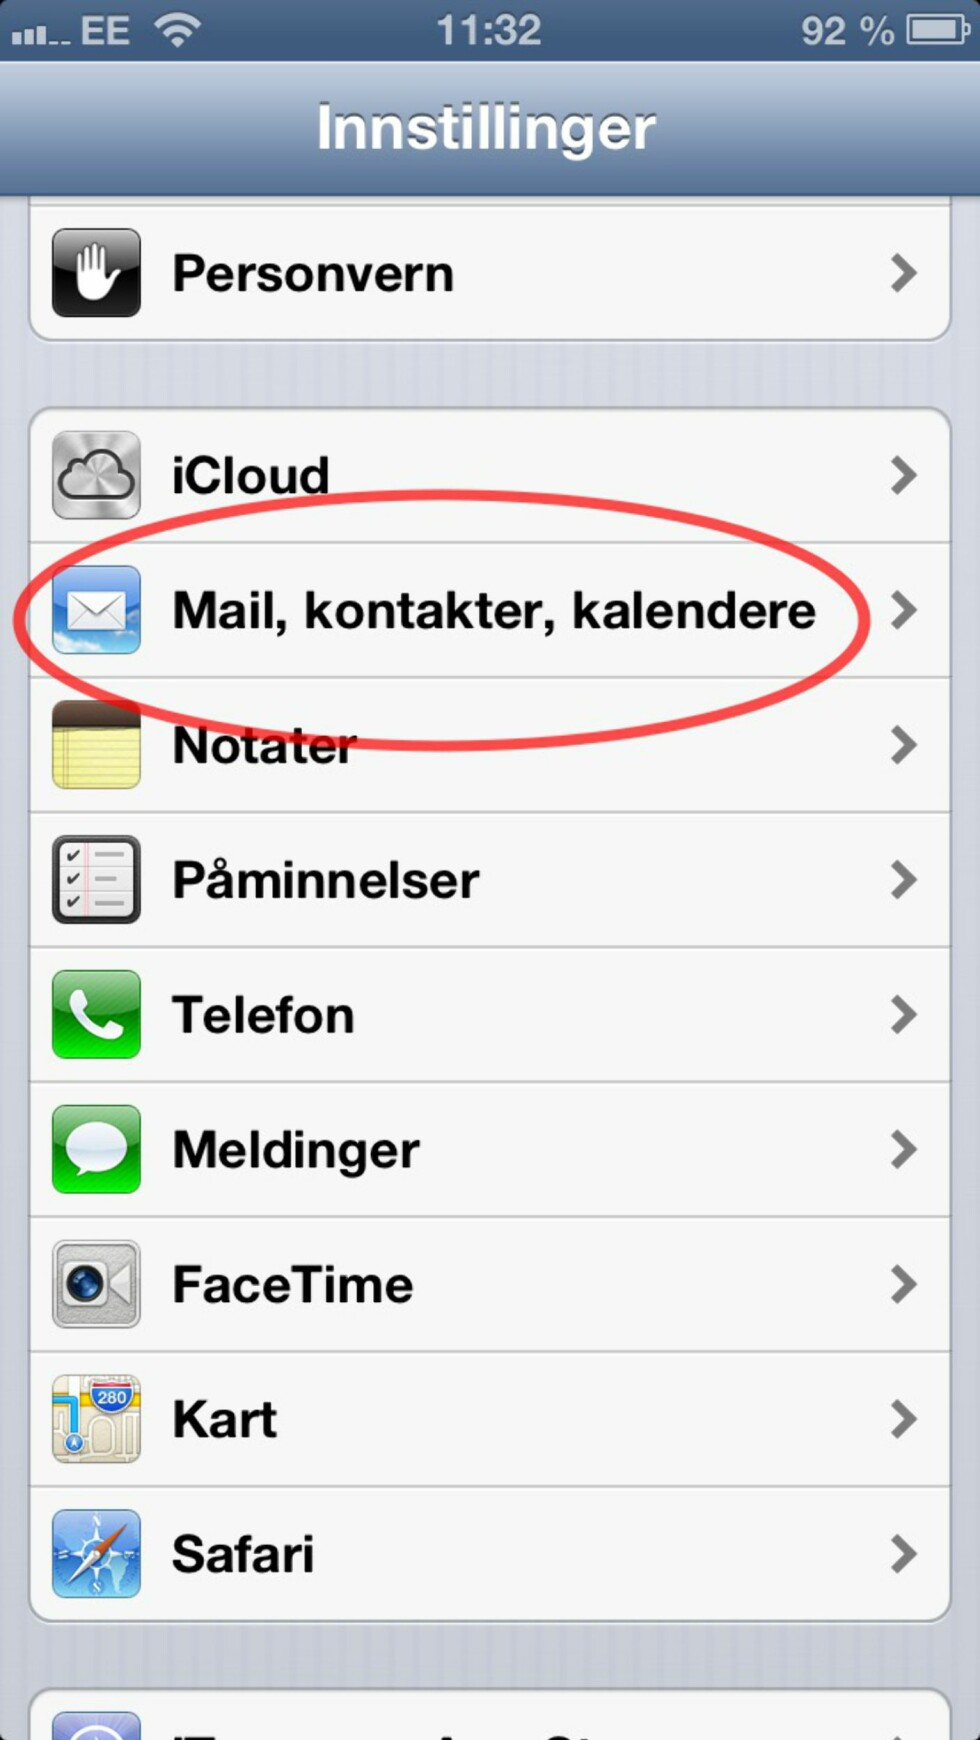 Last ned all eposten på iPhone/iPad/iPod Touch